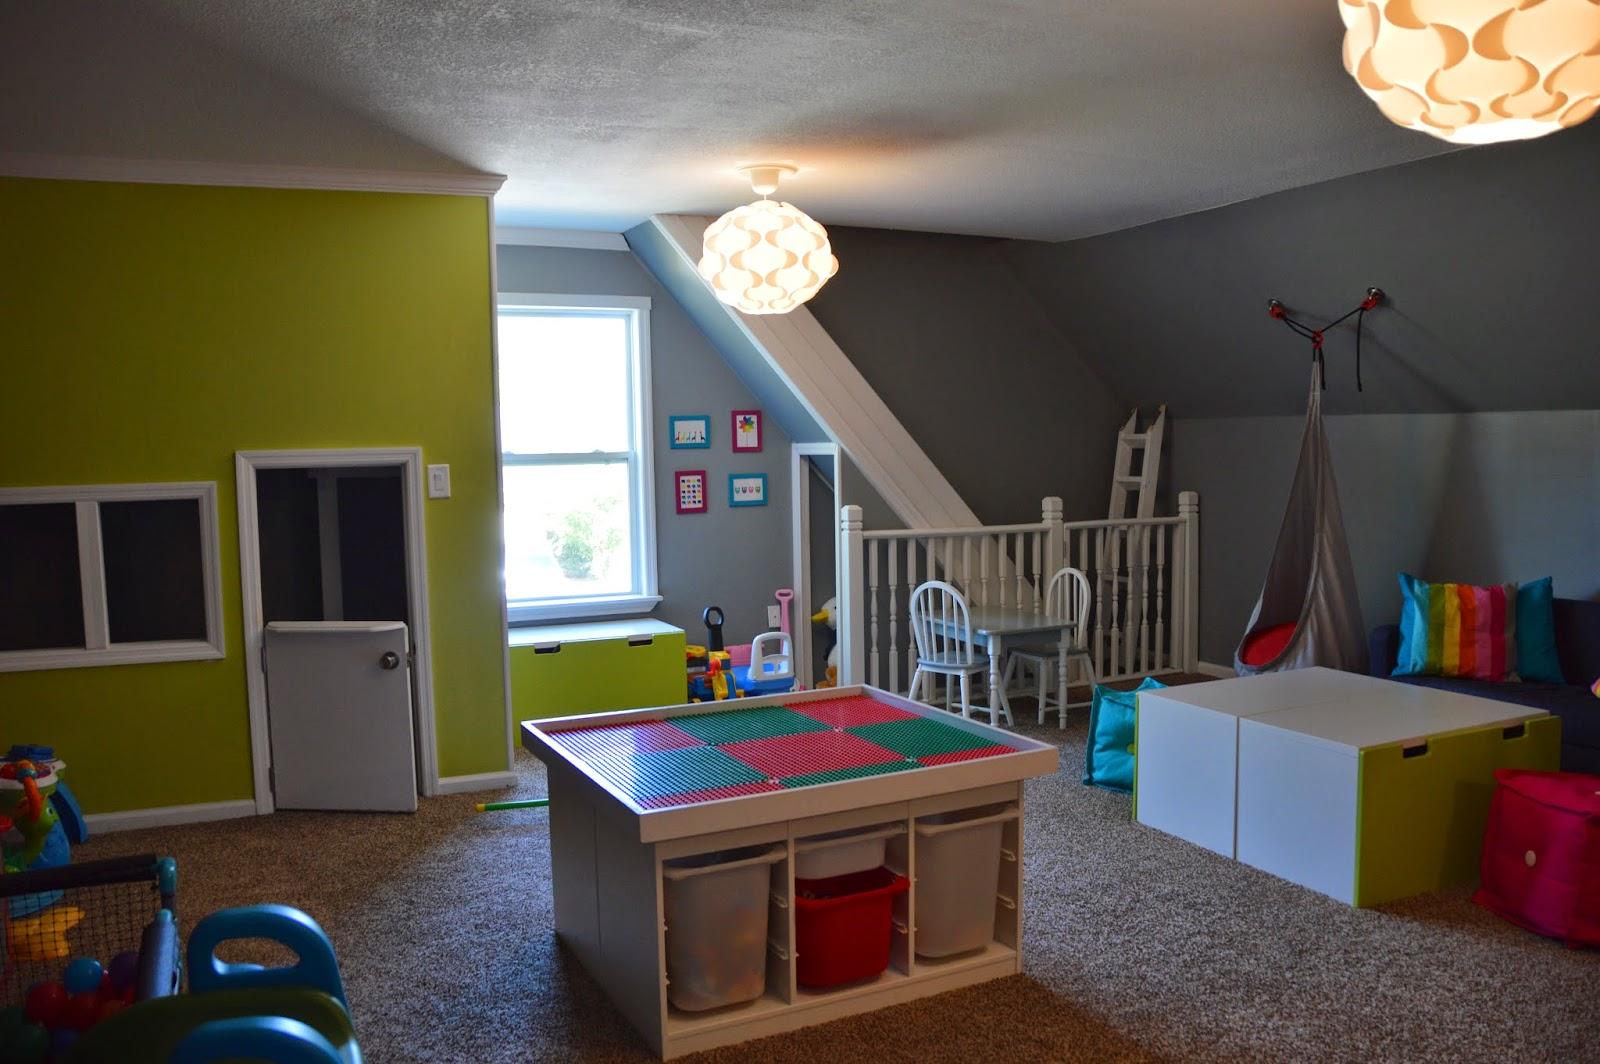 Kinderspielzimmer mit IKEA STUVA und Kallax